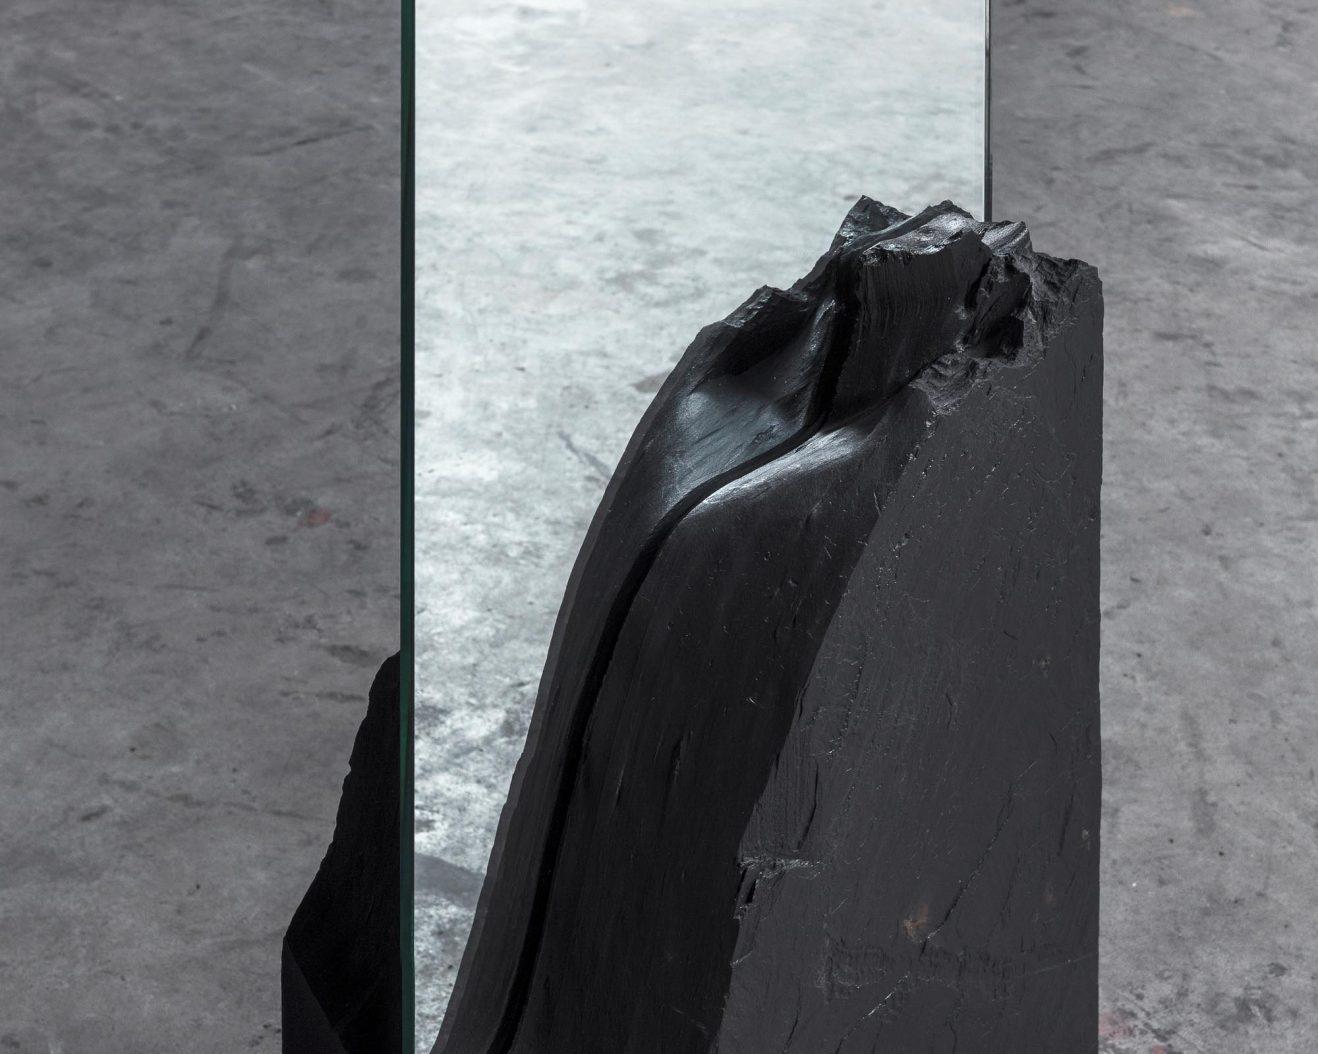 Frederic-Saulou-Farouche-Mirror-Savannah Bay Gallery-2